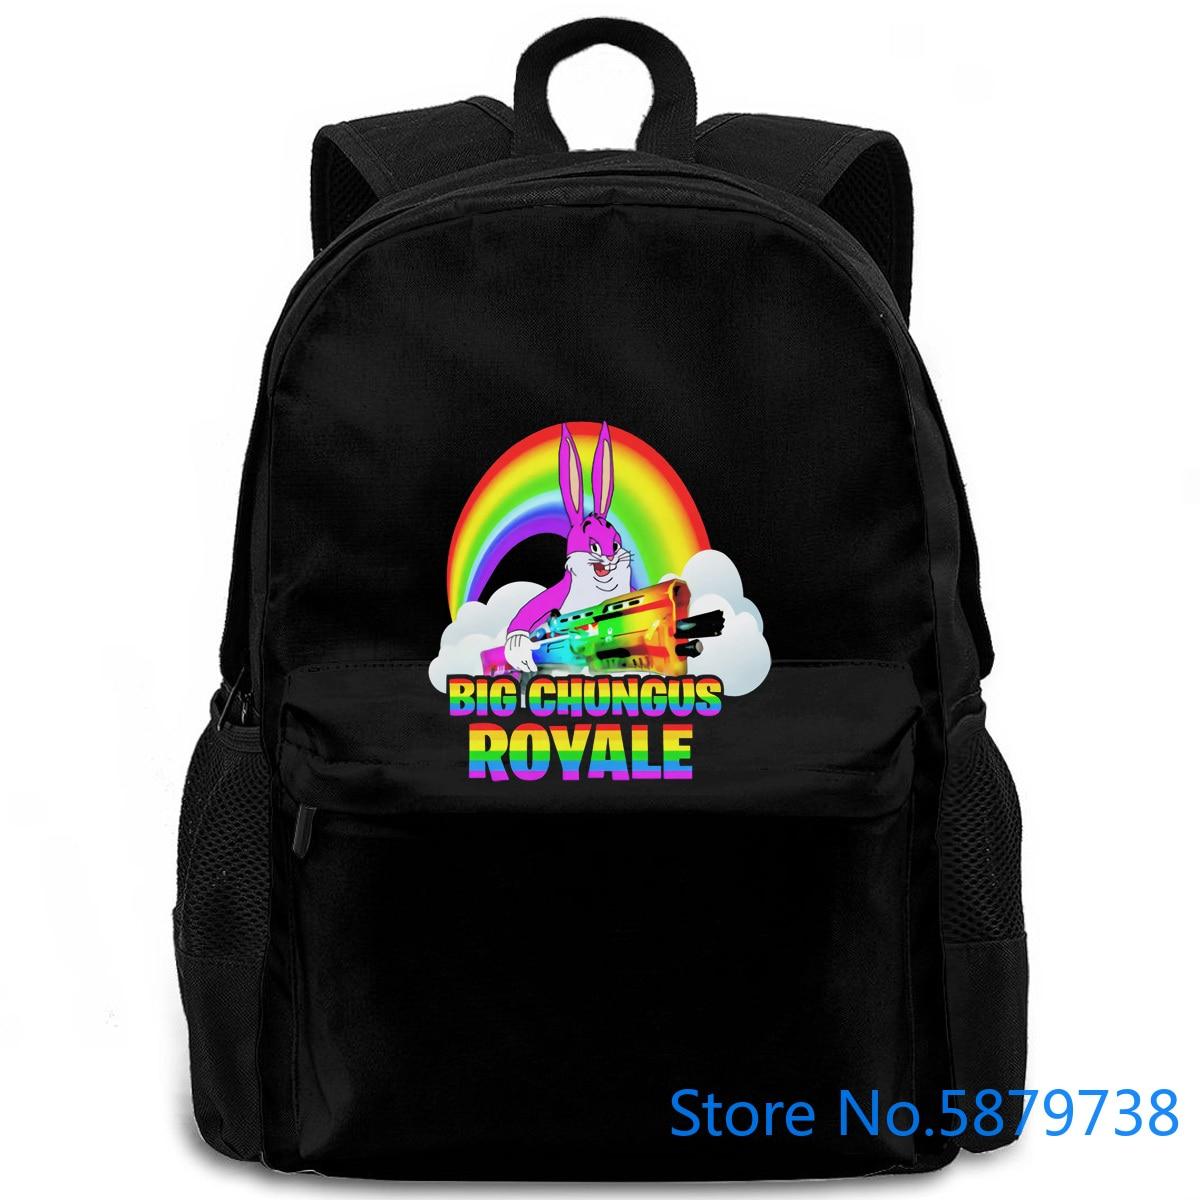 "Arco Iris ""Big Chungus Royale"" juvenil big chungus Meme Para Mujeres Hombres mochila portátil viaje escuela estudiante adulto"